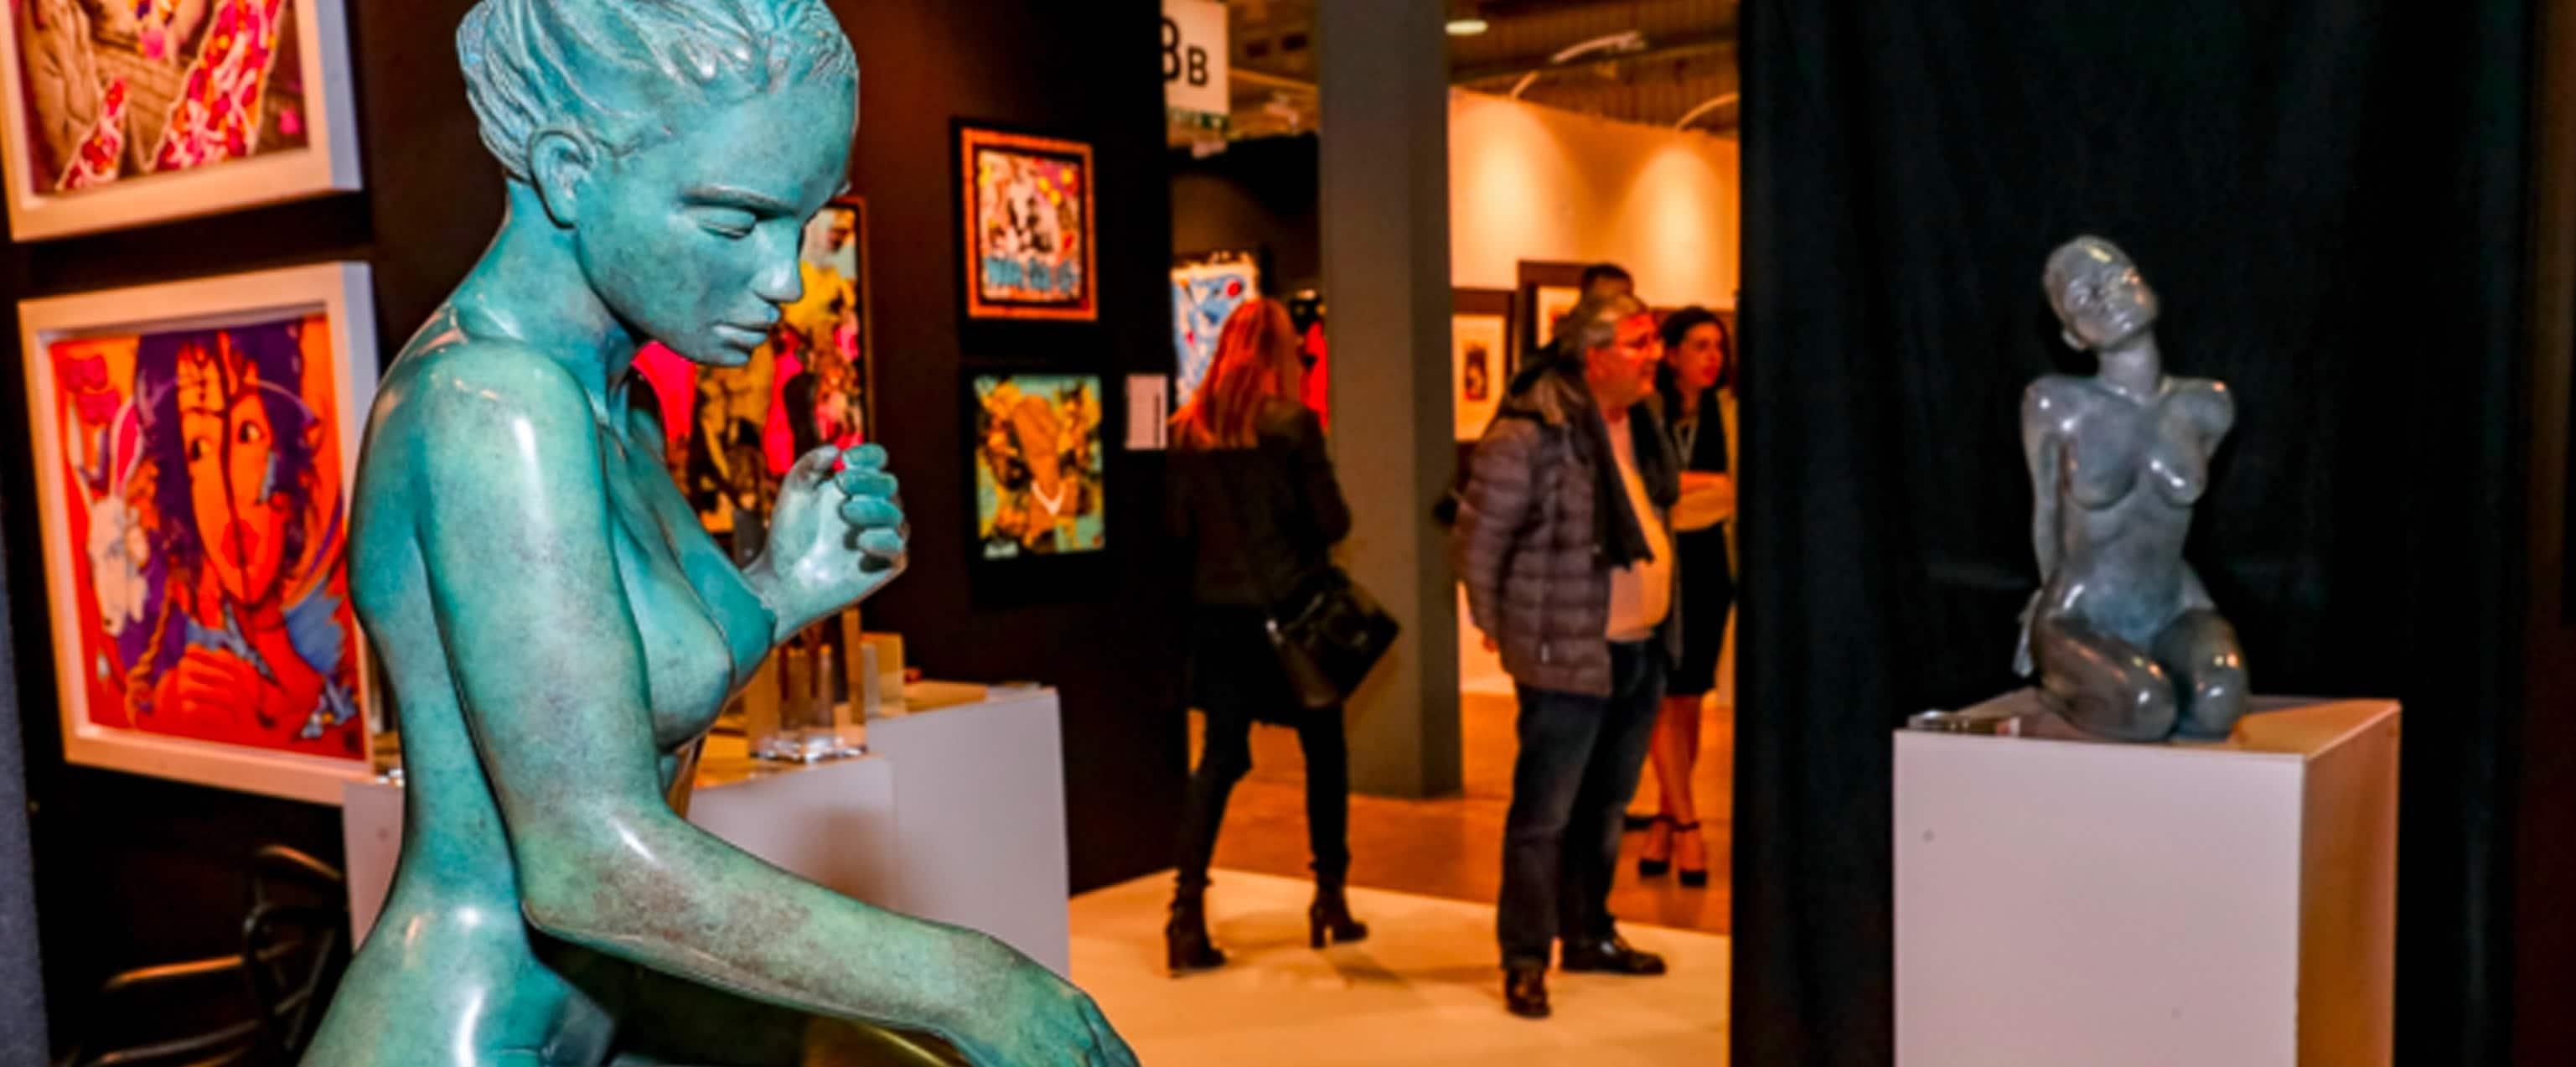 Luxembourg Art Fair 2019 Galerie Don Carli